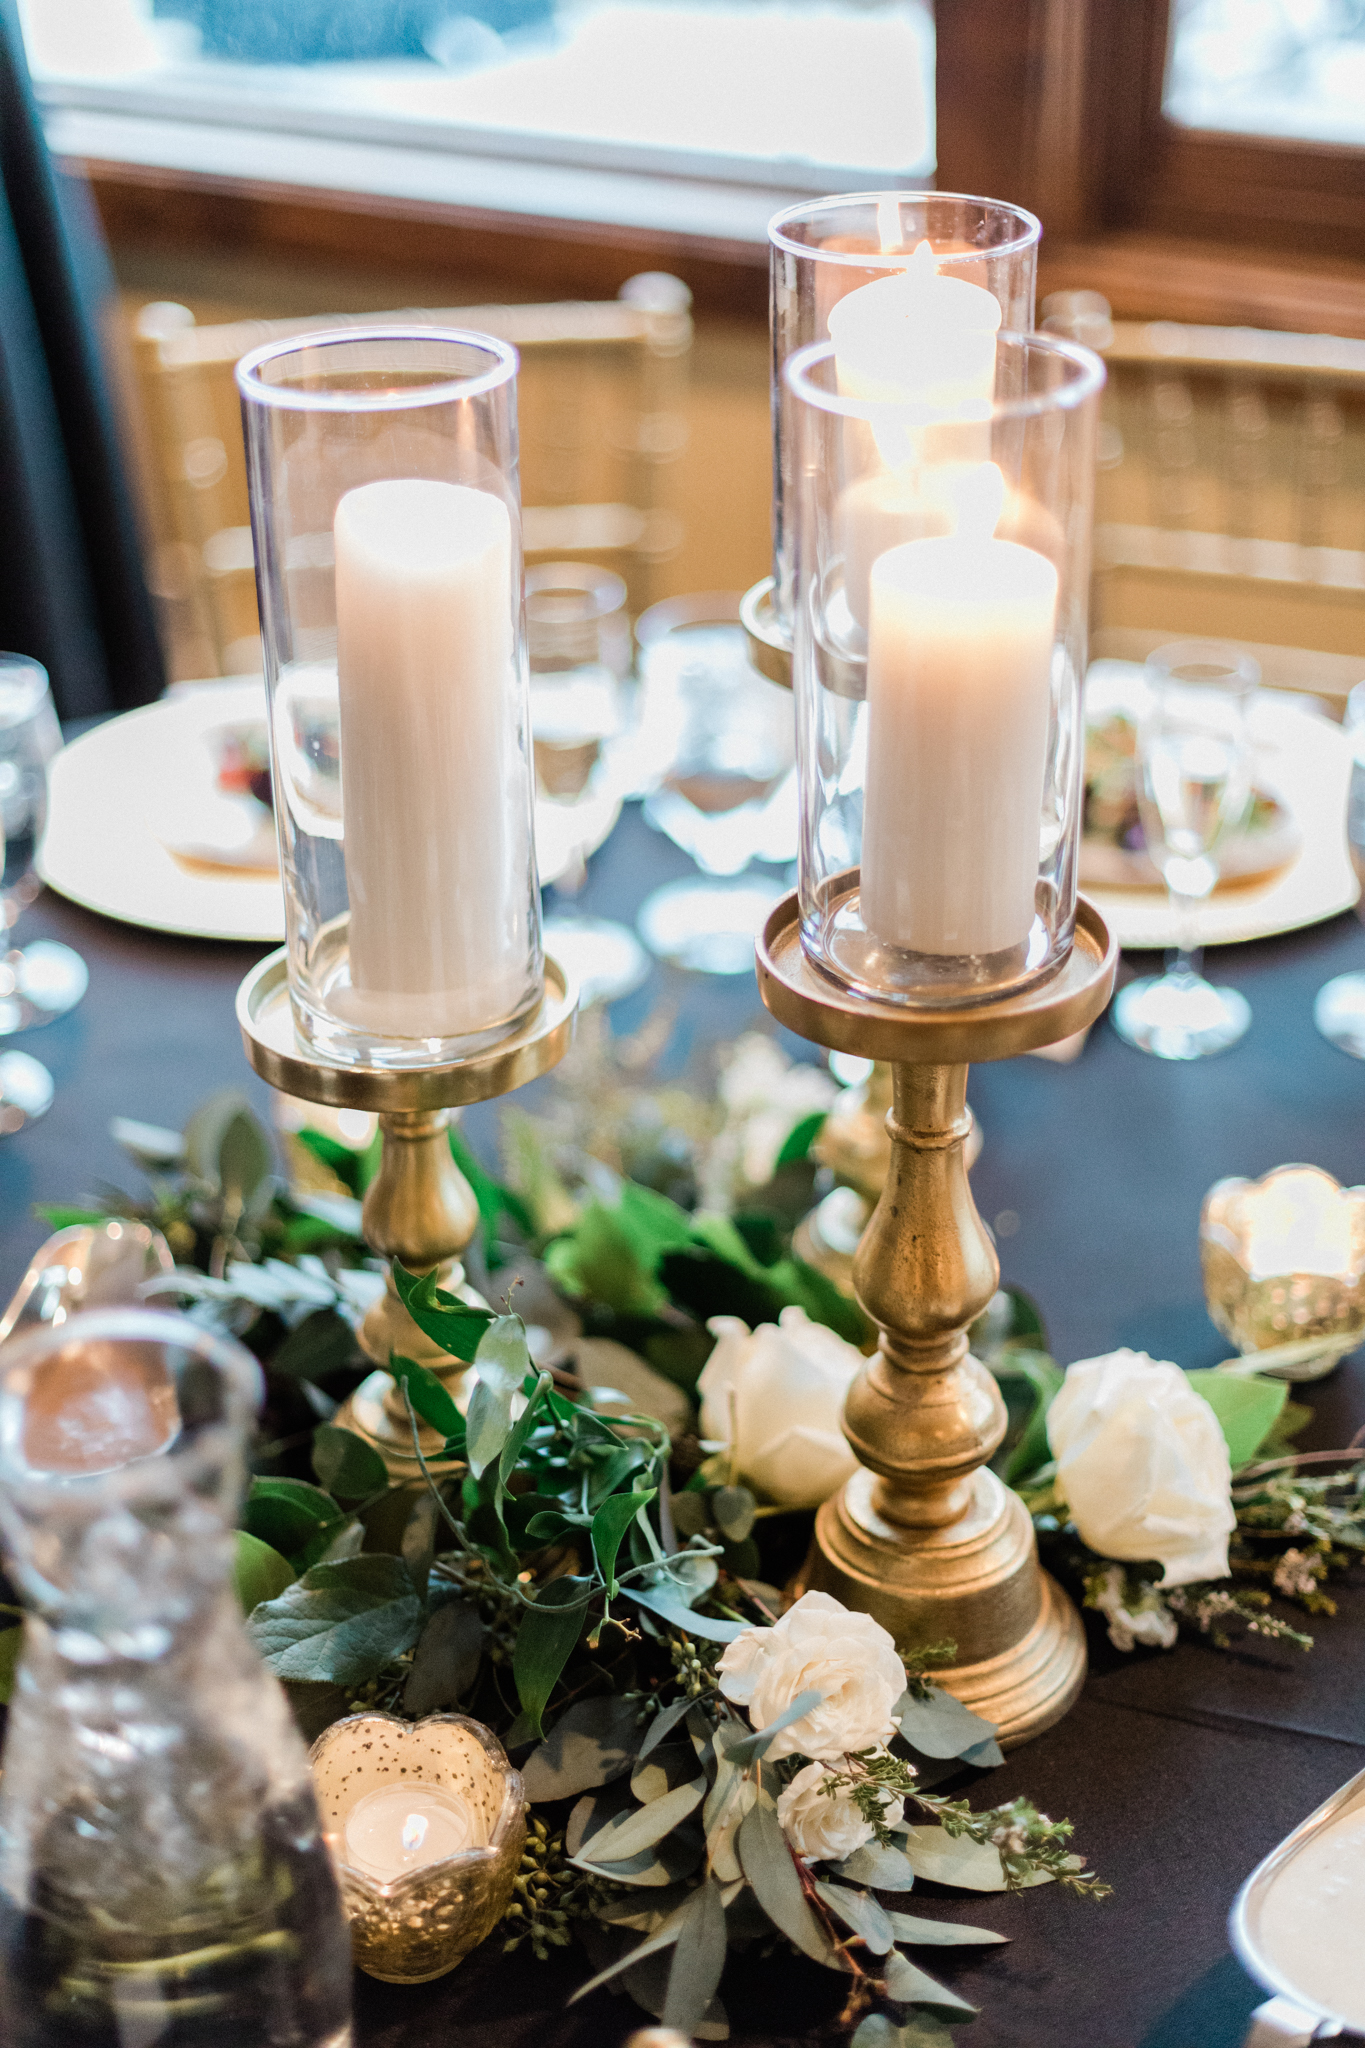 Lodge at Breckenridge Winter Wedding Table Setting